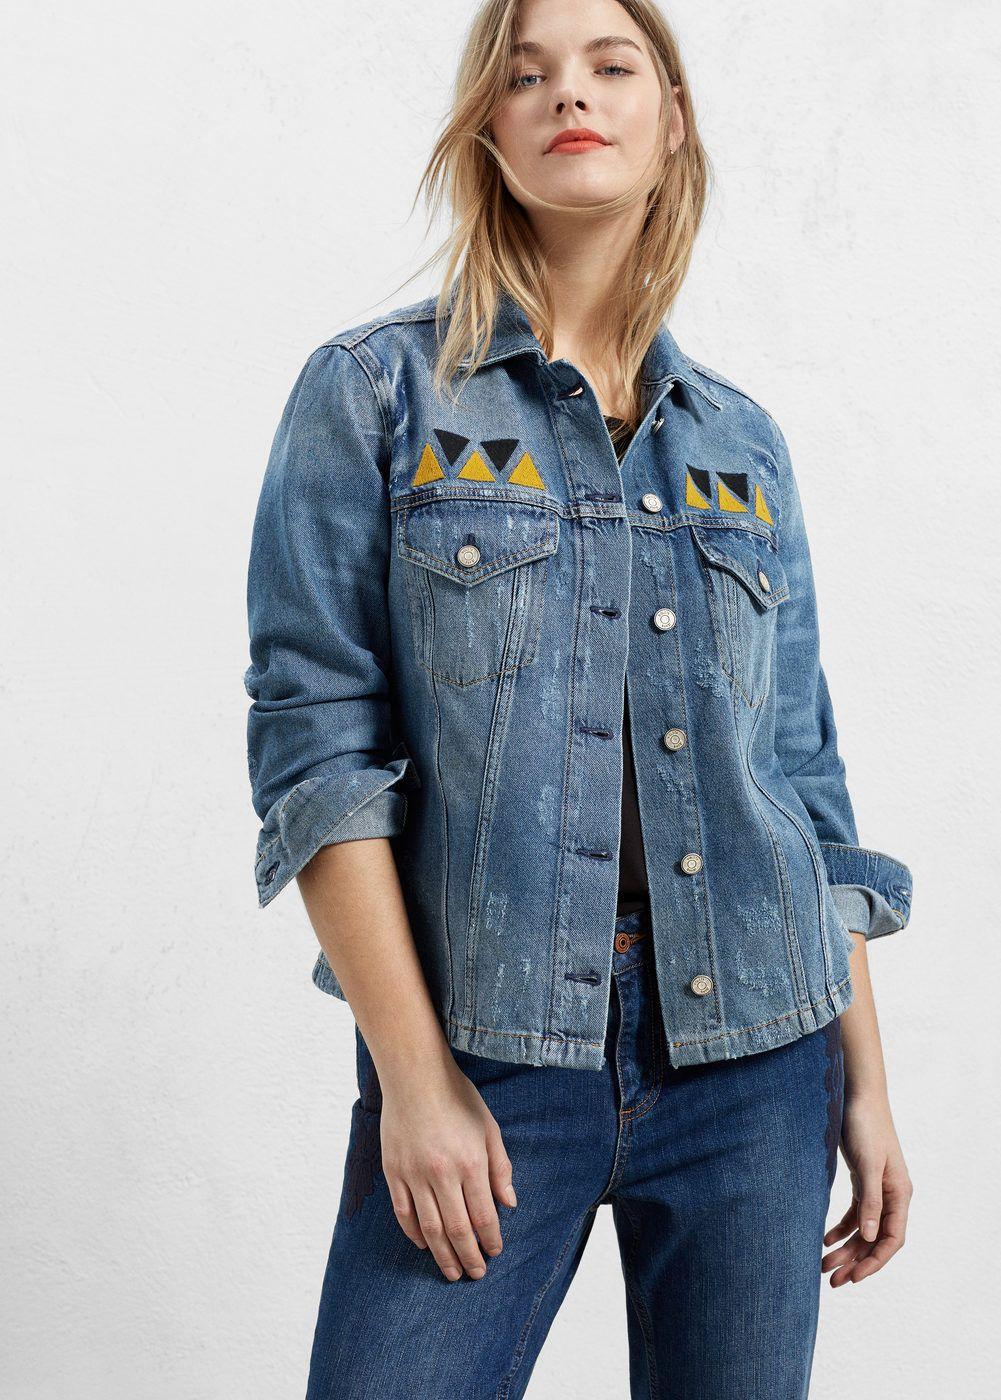 d77468beeb1 Fifty Shades of Grey star Dakota Johnson models denim Gucci jacket at JFK  airport